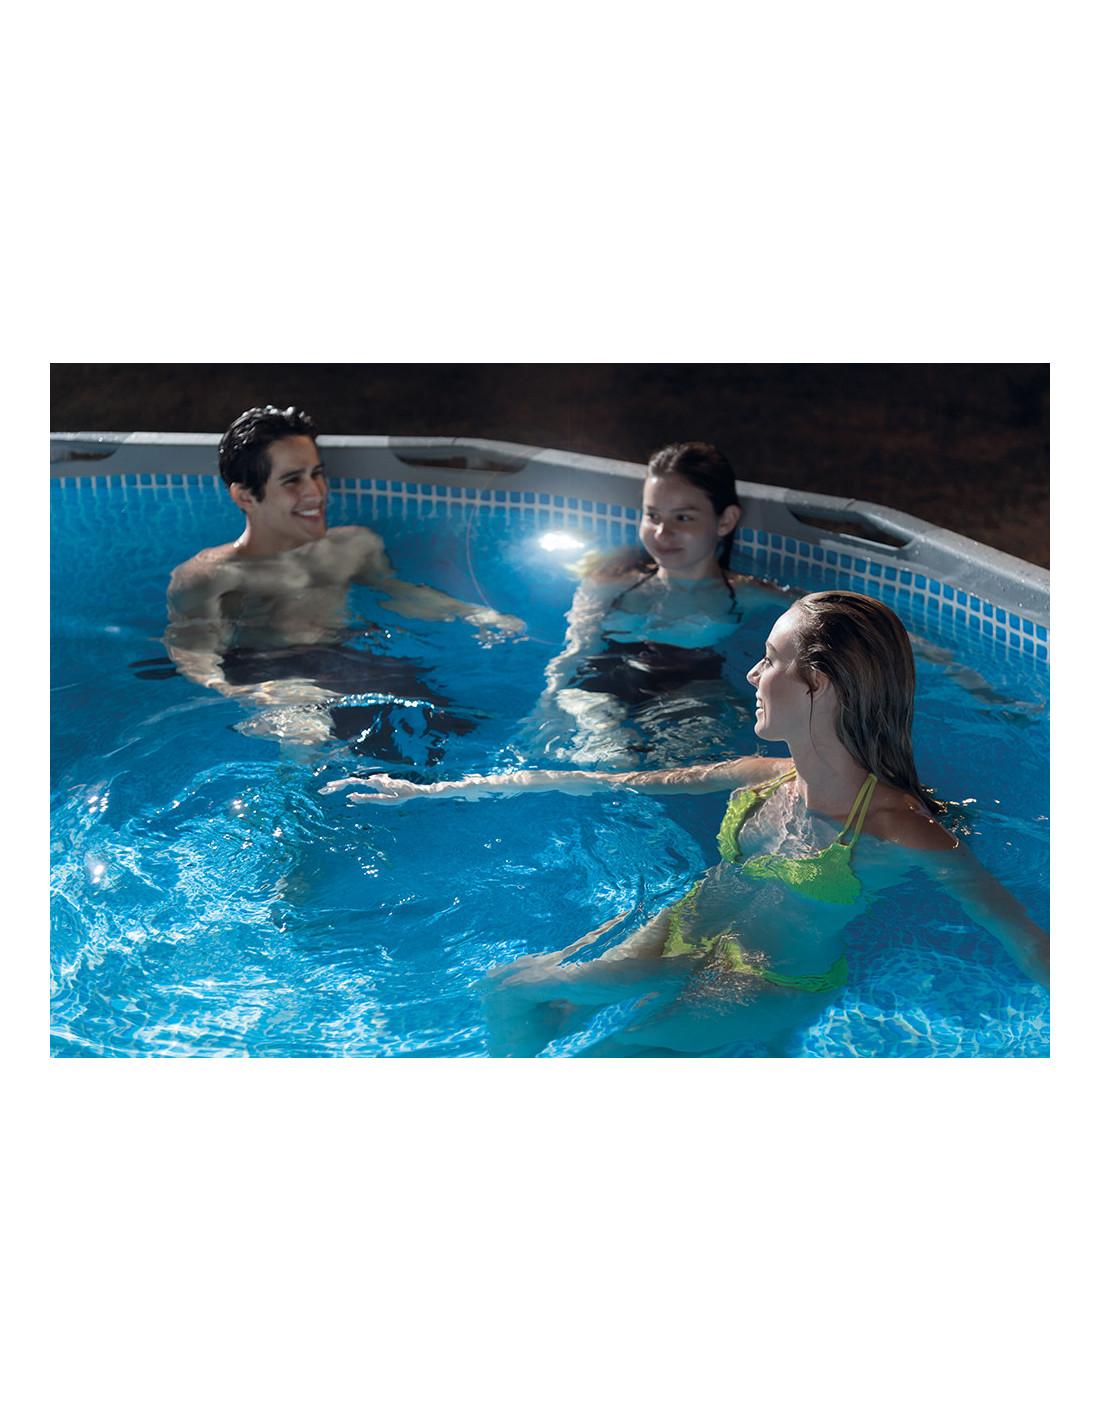 Lampe pour piscine beautiful nous with lampe pour piscine for Piscine hyper u